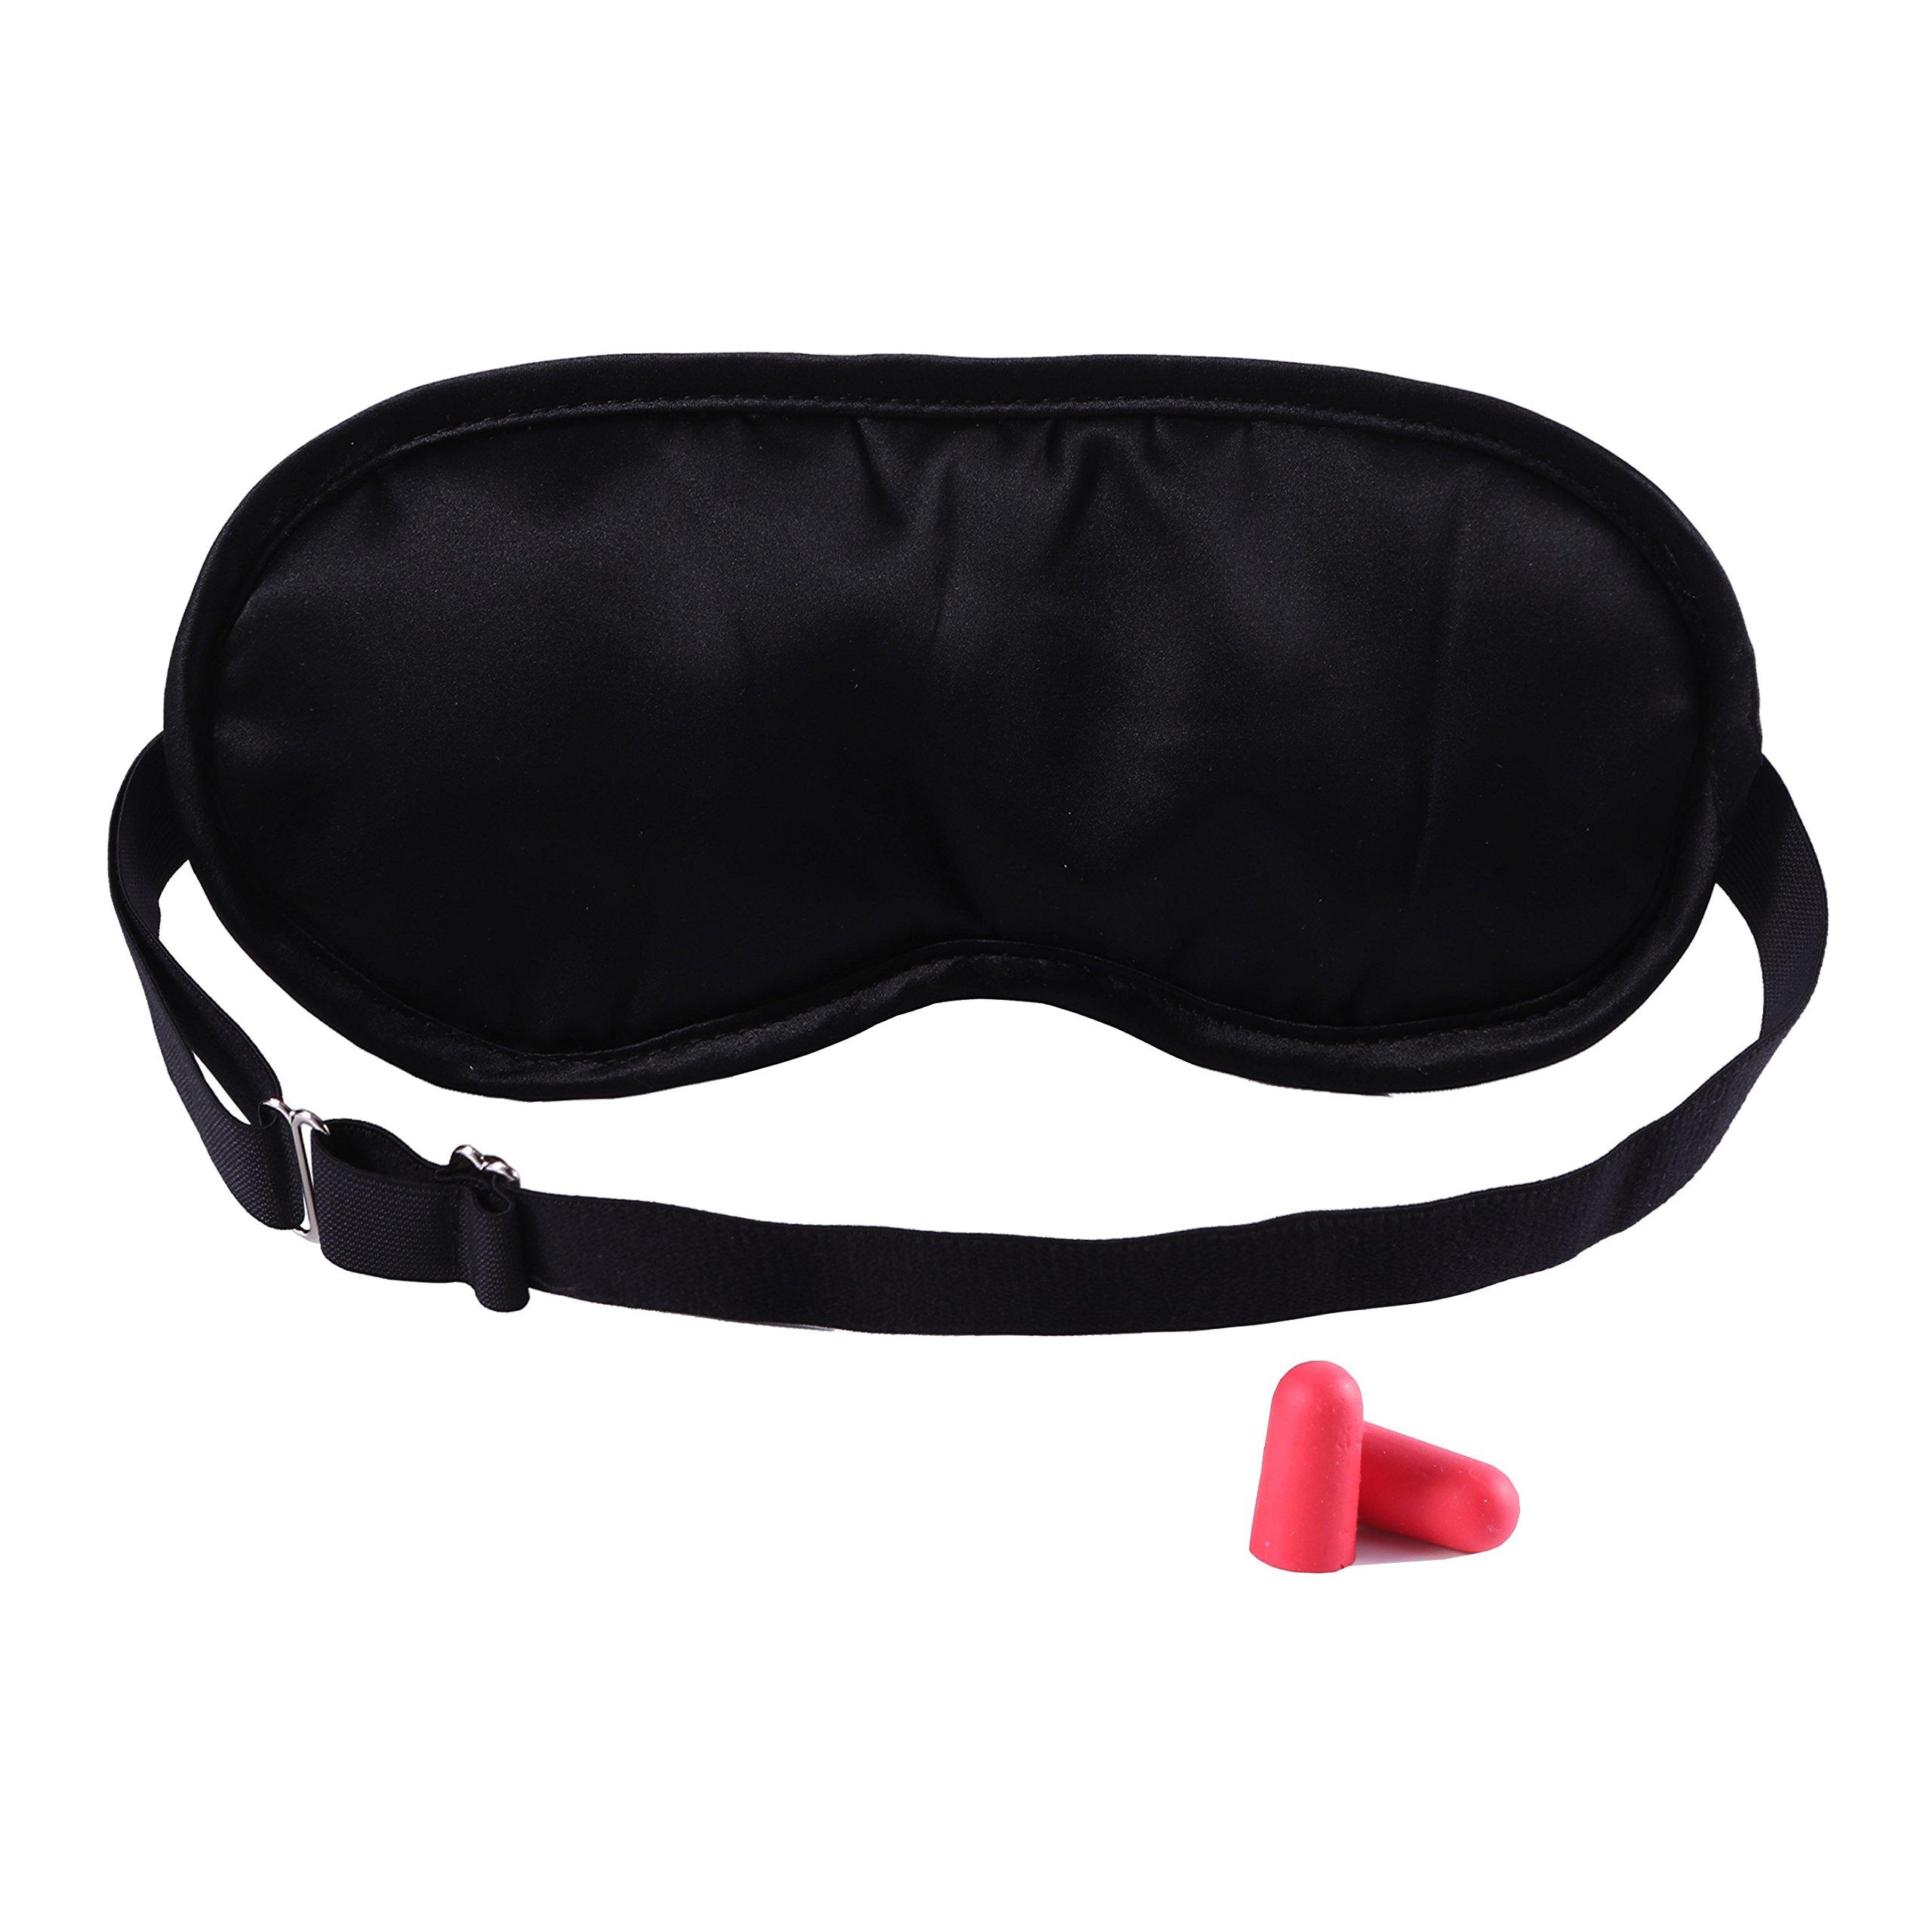 Silk Sleep Mask for Women,Men,Soft Light Blocking Natural Silk Sleeping Eye Mask with Ear Plug Set for Travel, Blackout Blindfold with Adjustable Strap